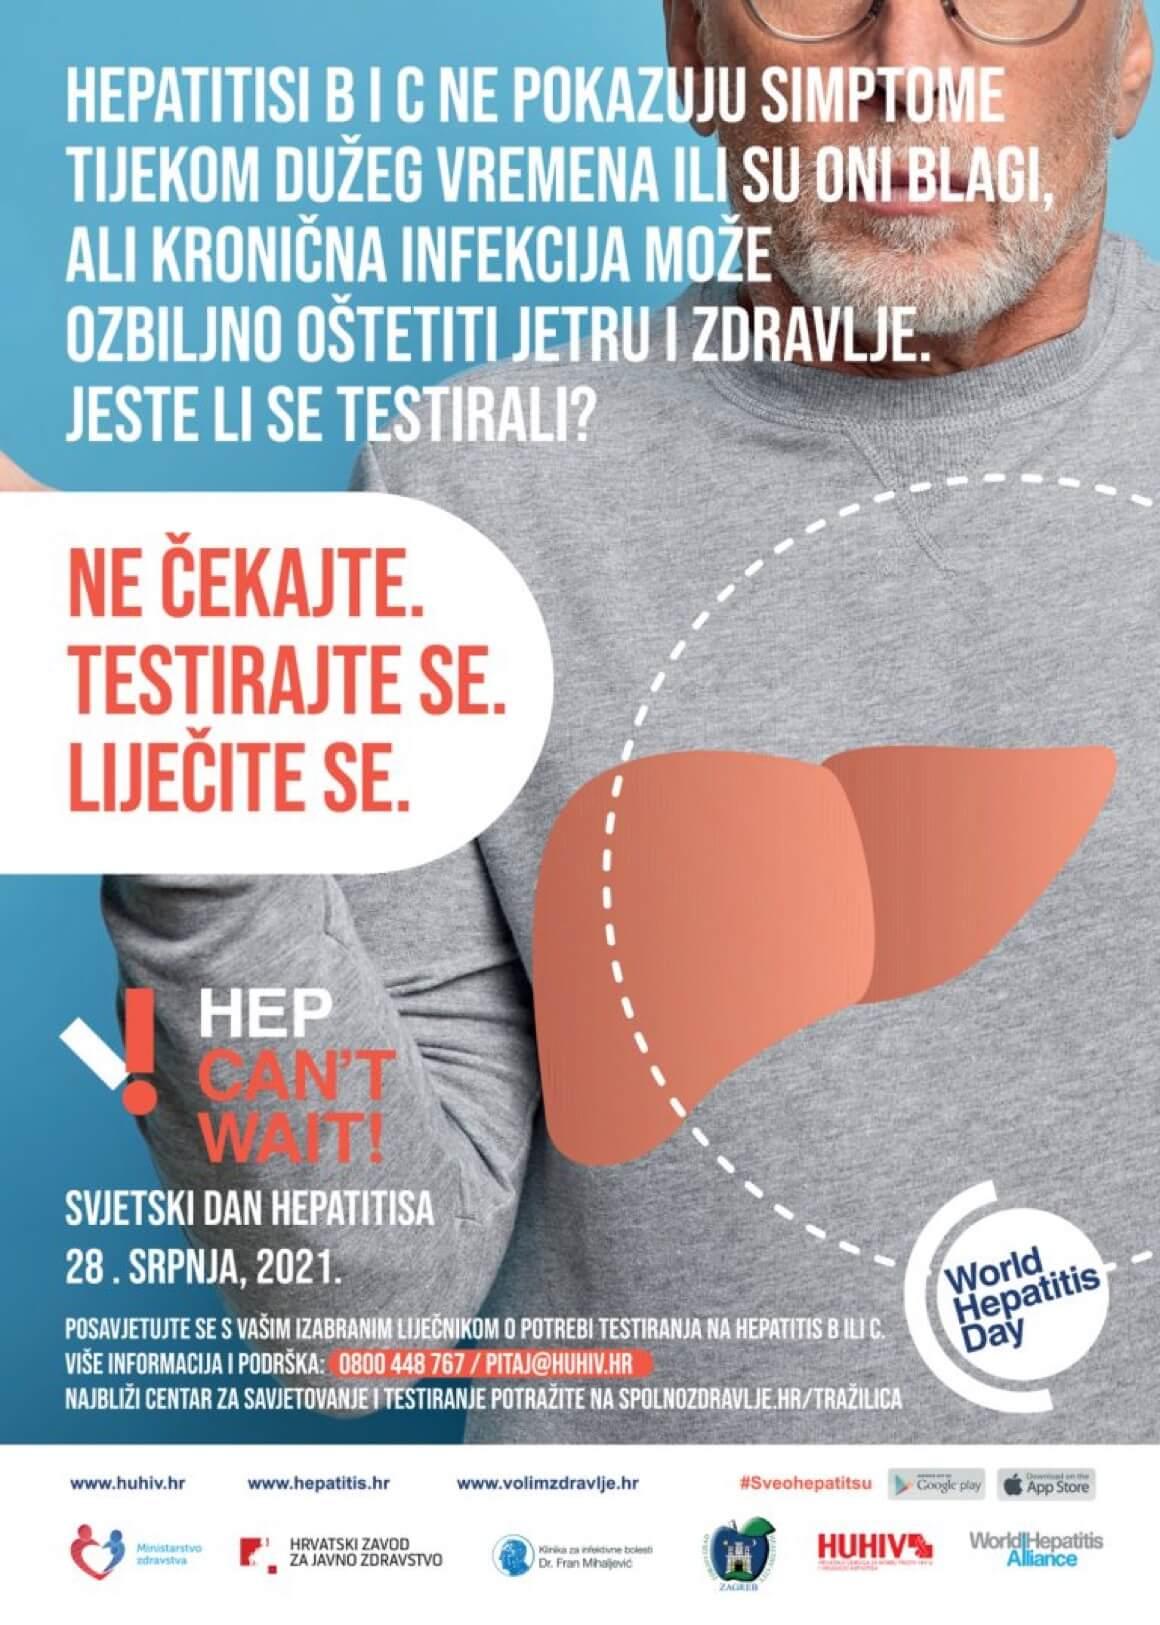 Hepatitis kampanja